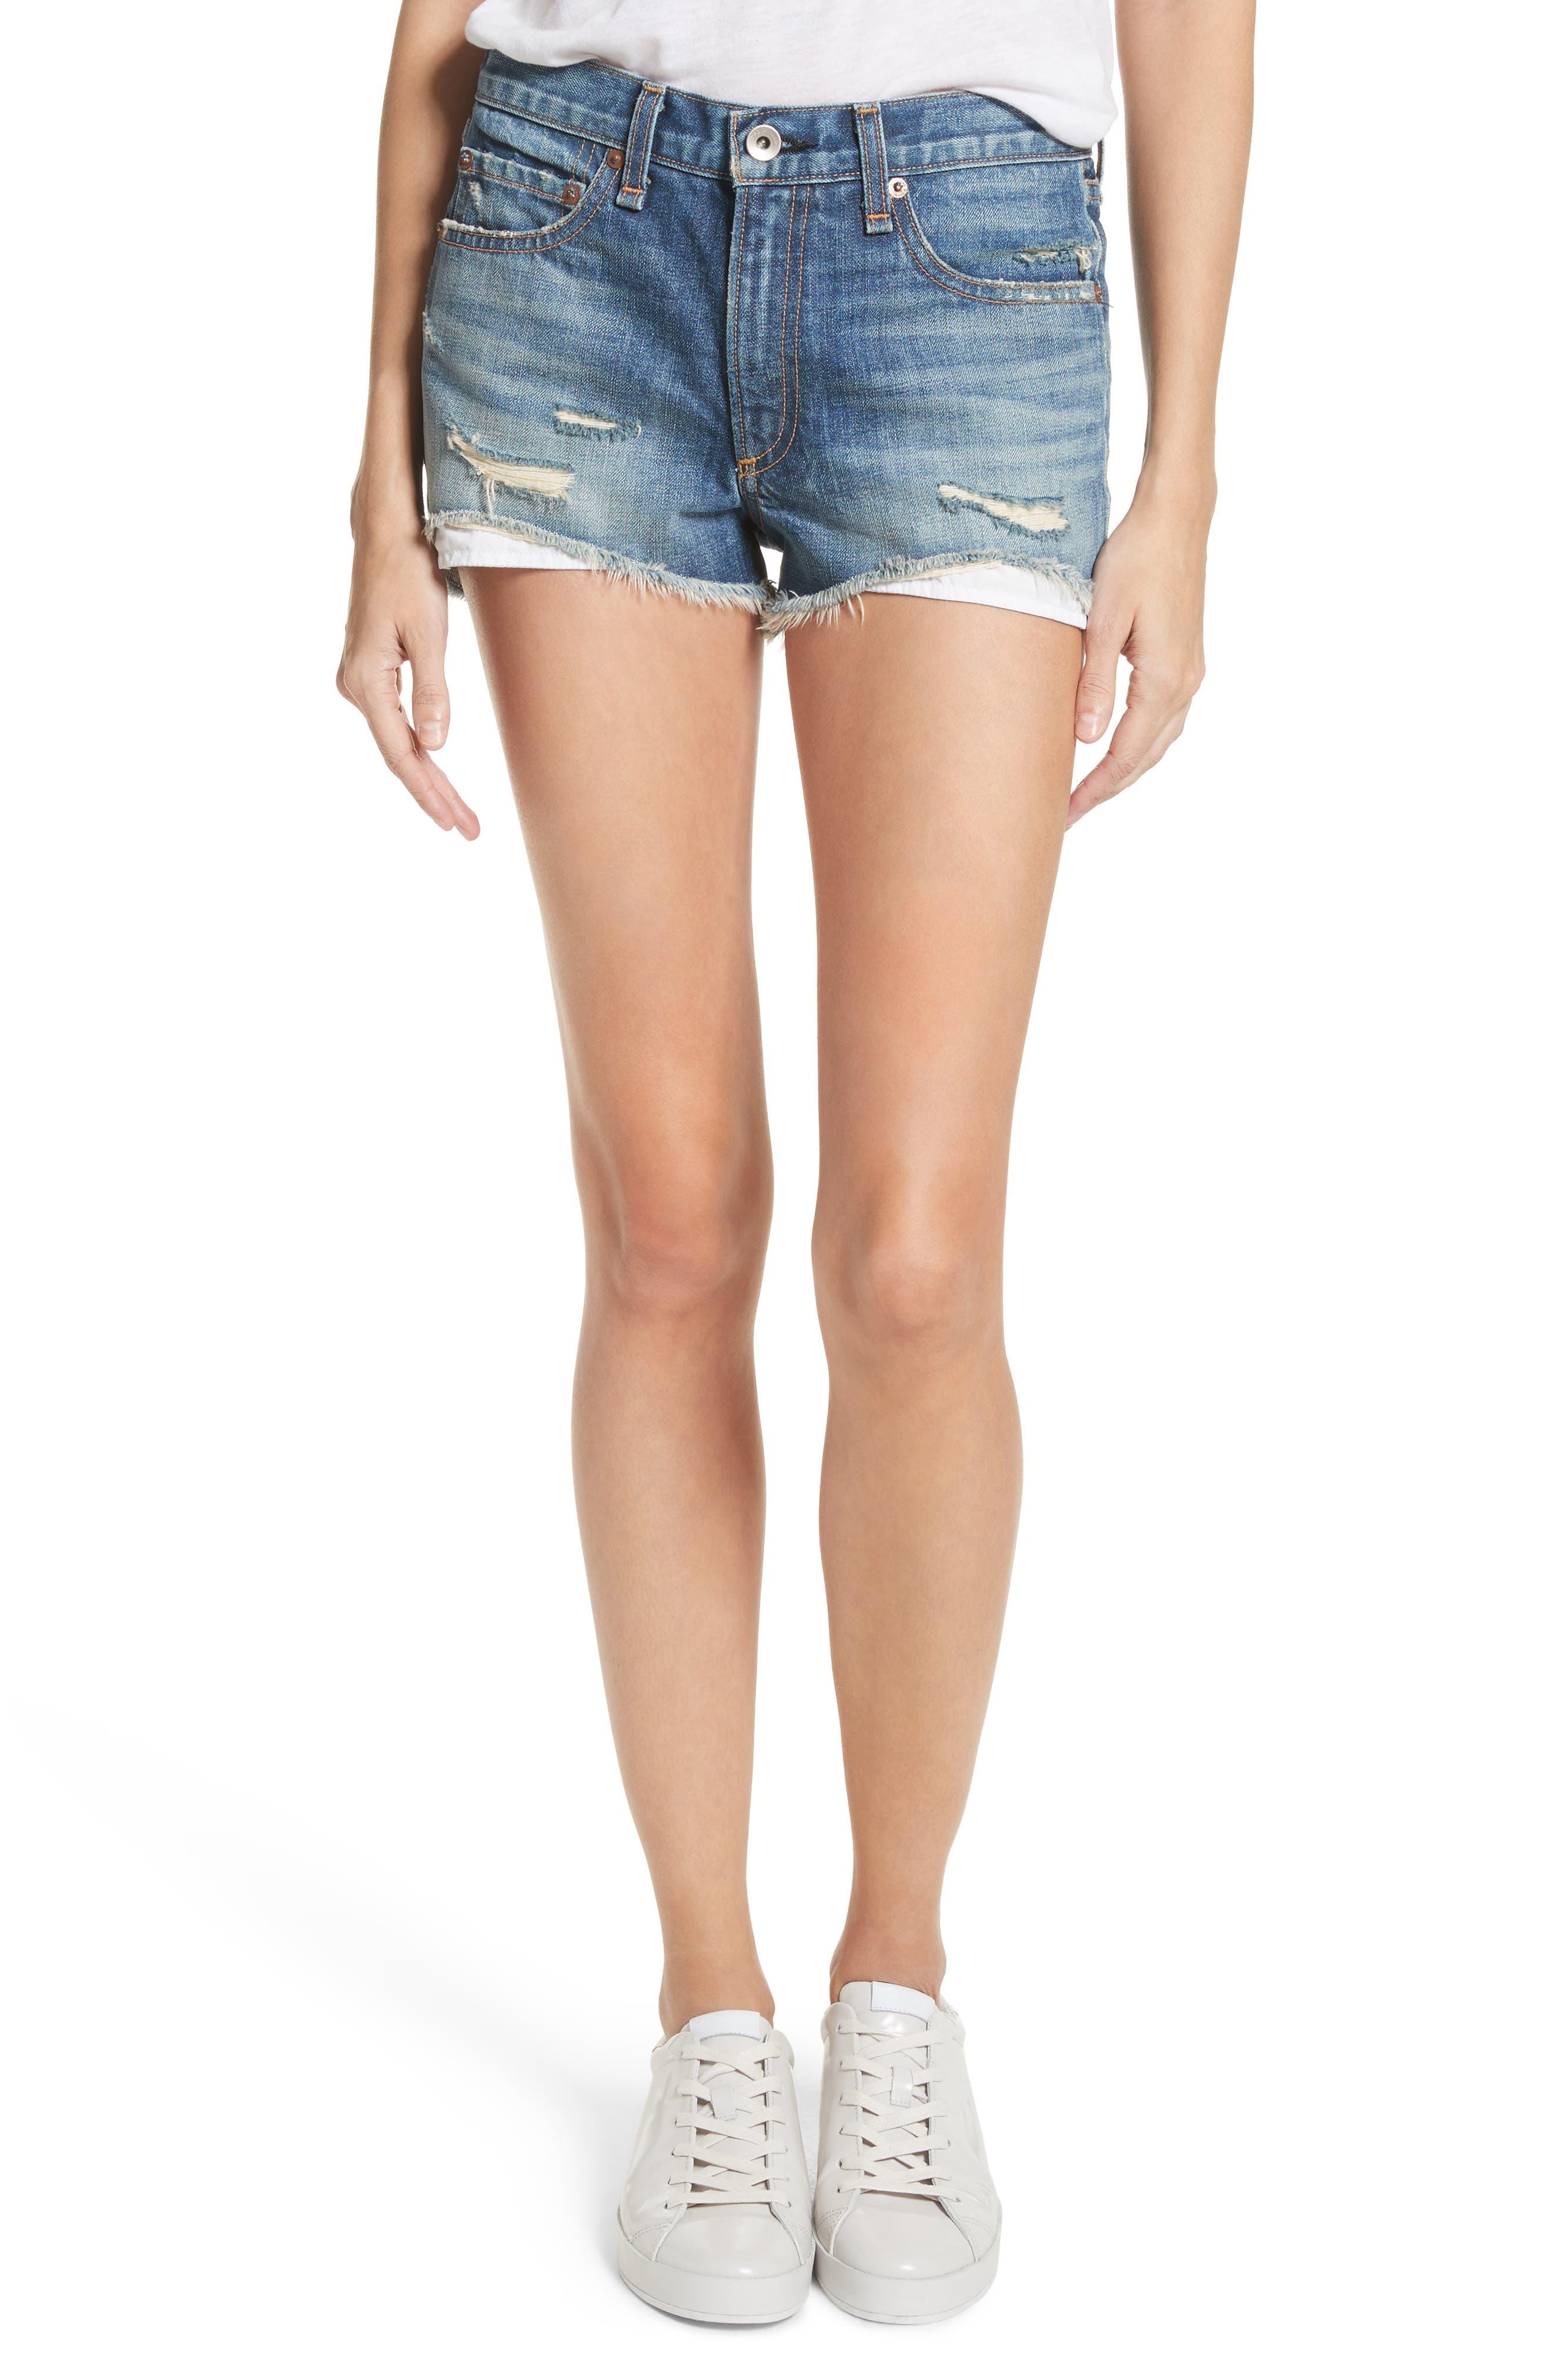 Main Image - rag & bone/JEAN Margaux High Waist Denim Shorts (Rocka Rolla)